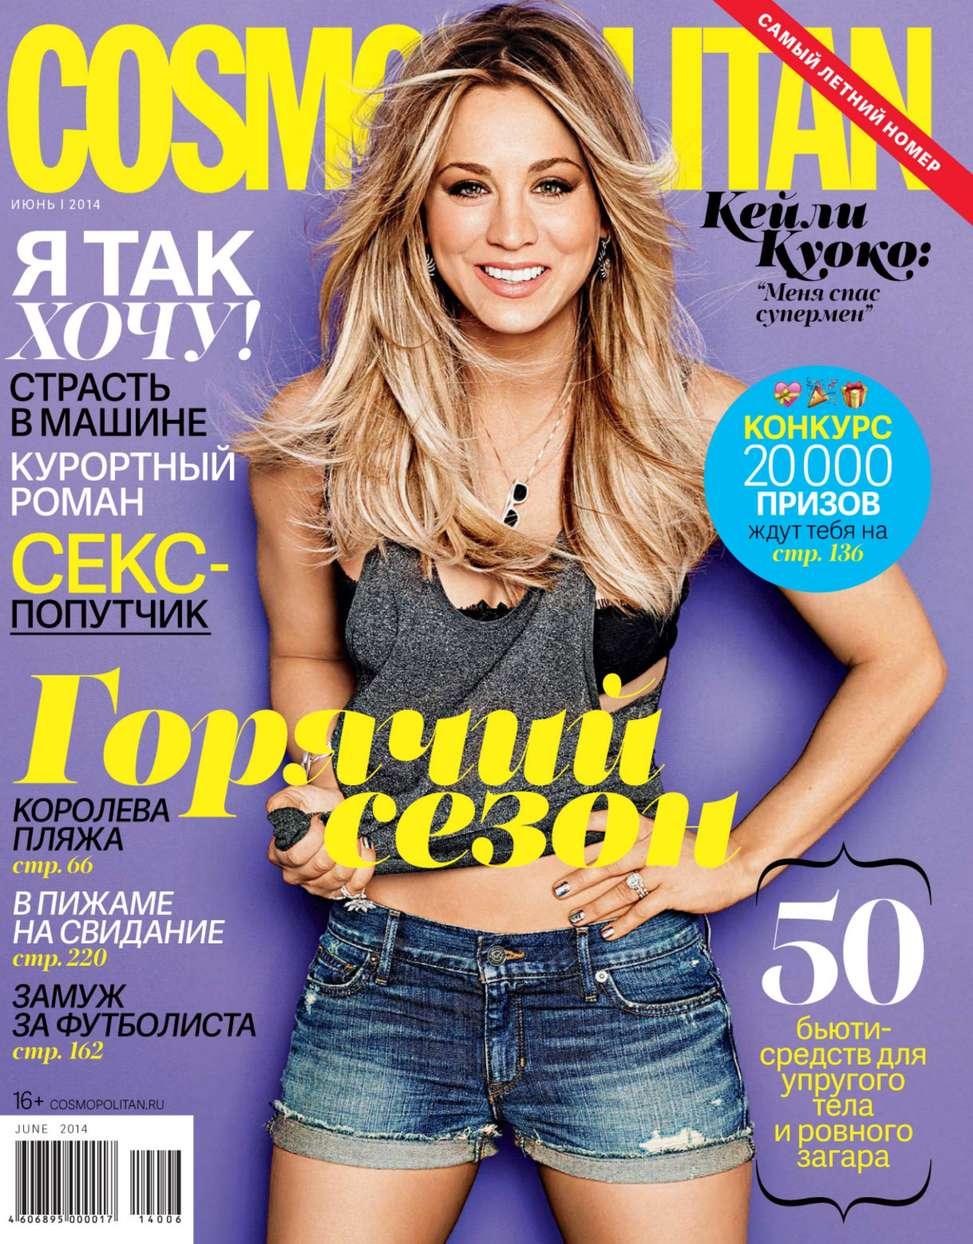 Cosmopolitan 06-2014